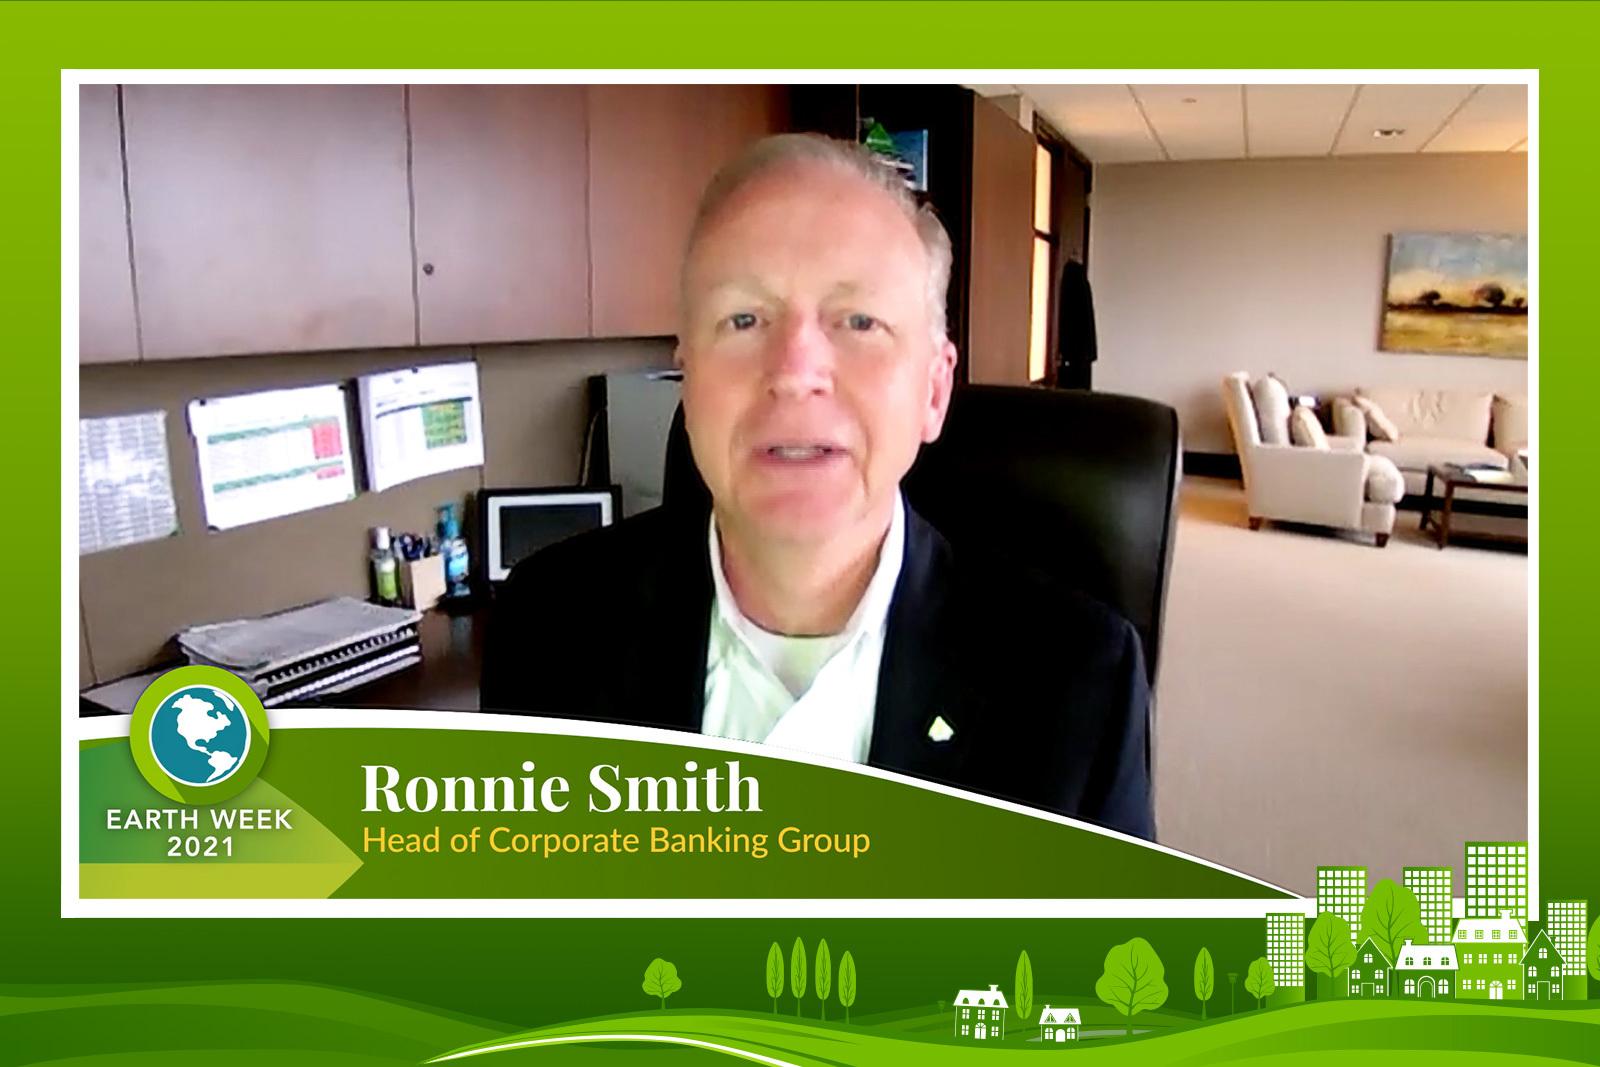 Ronnie Smith - Earth Week 2021